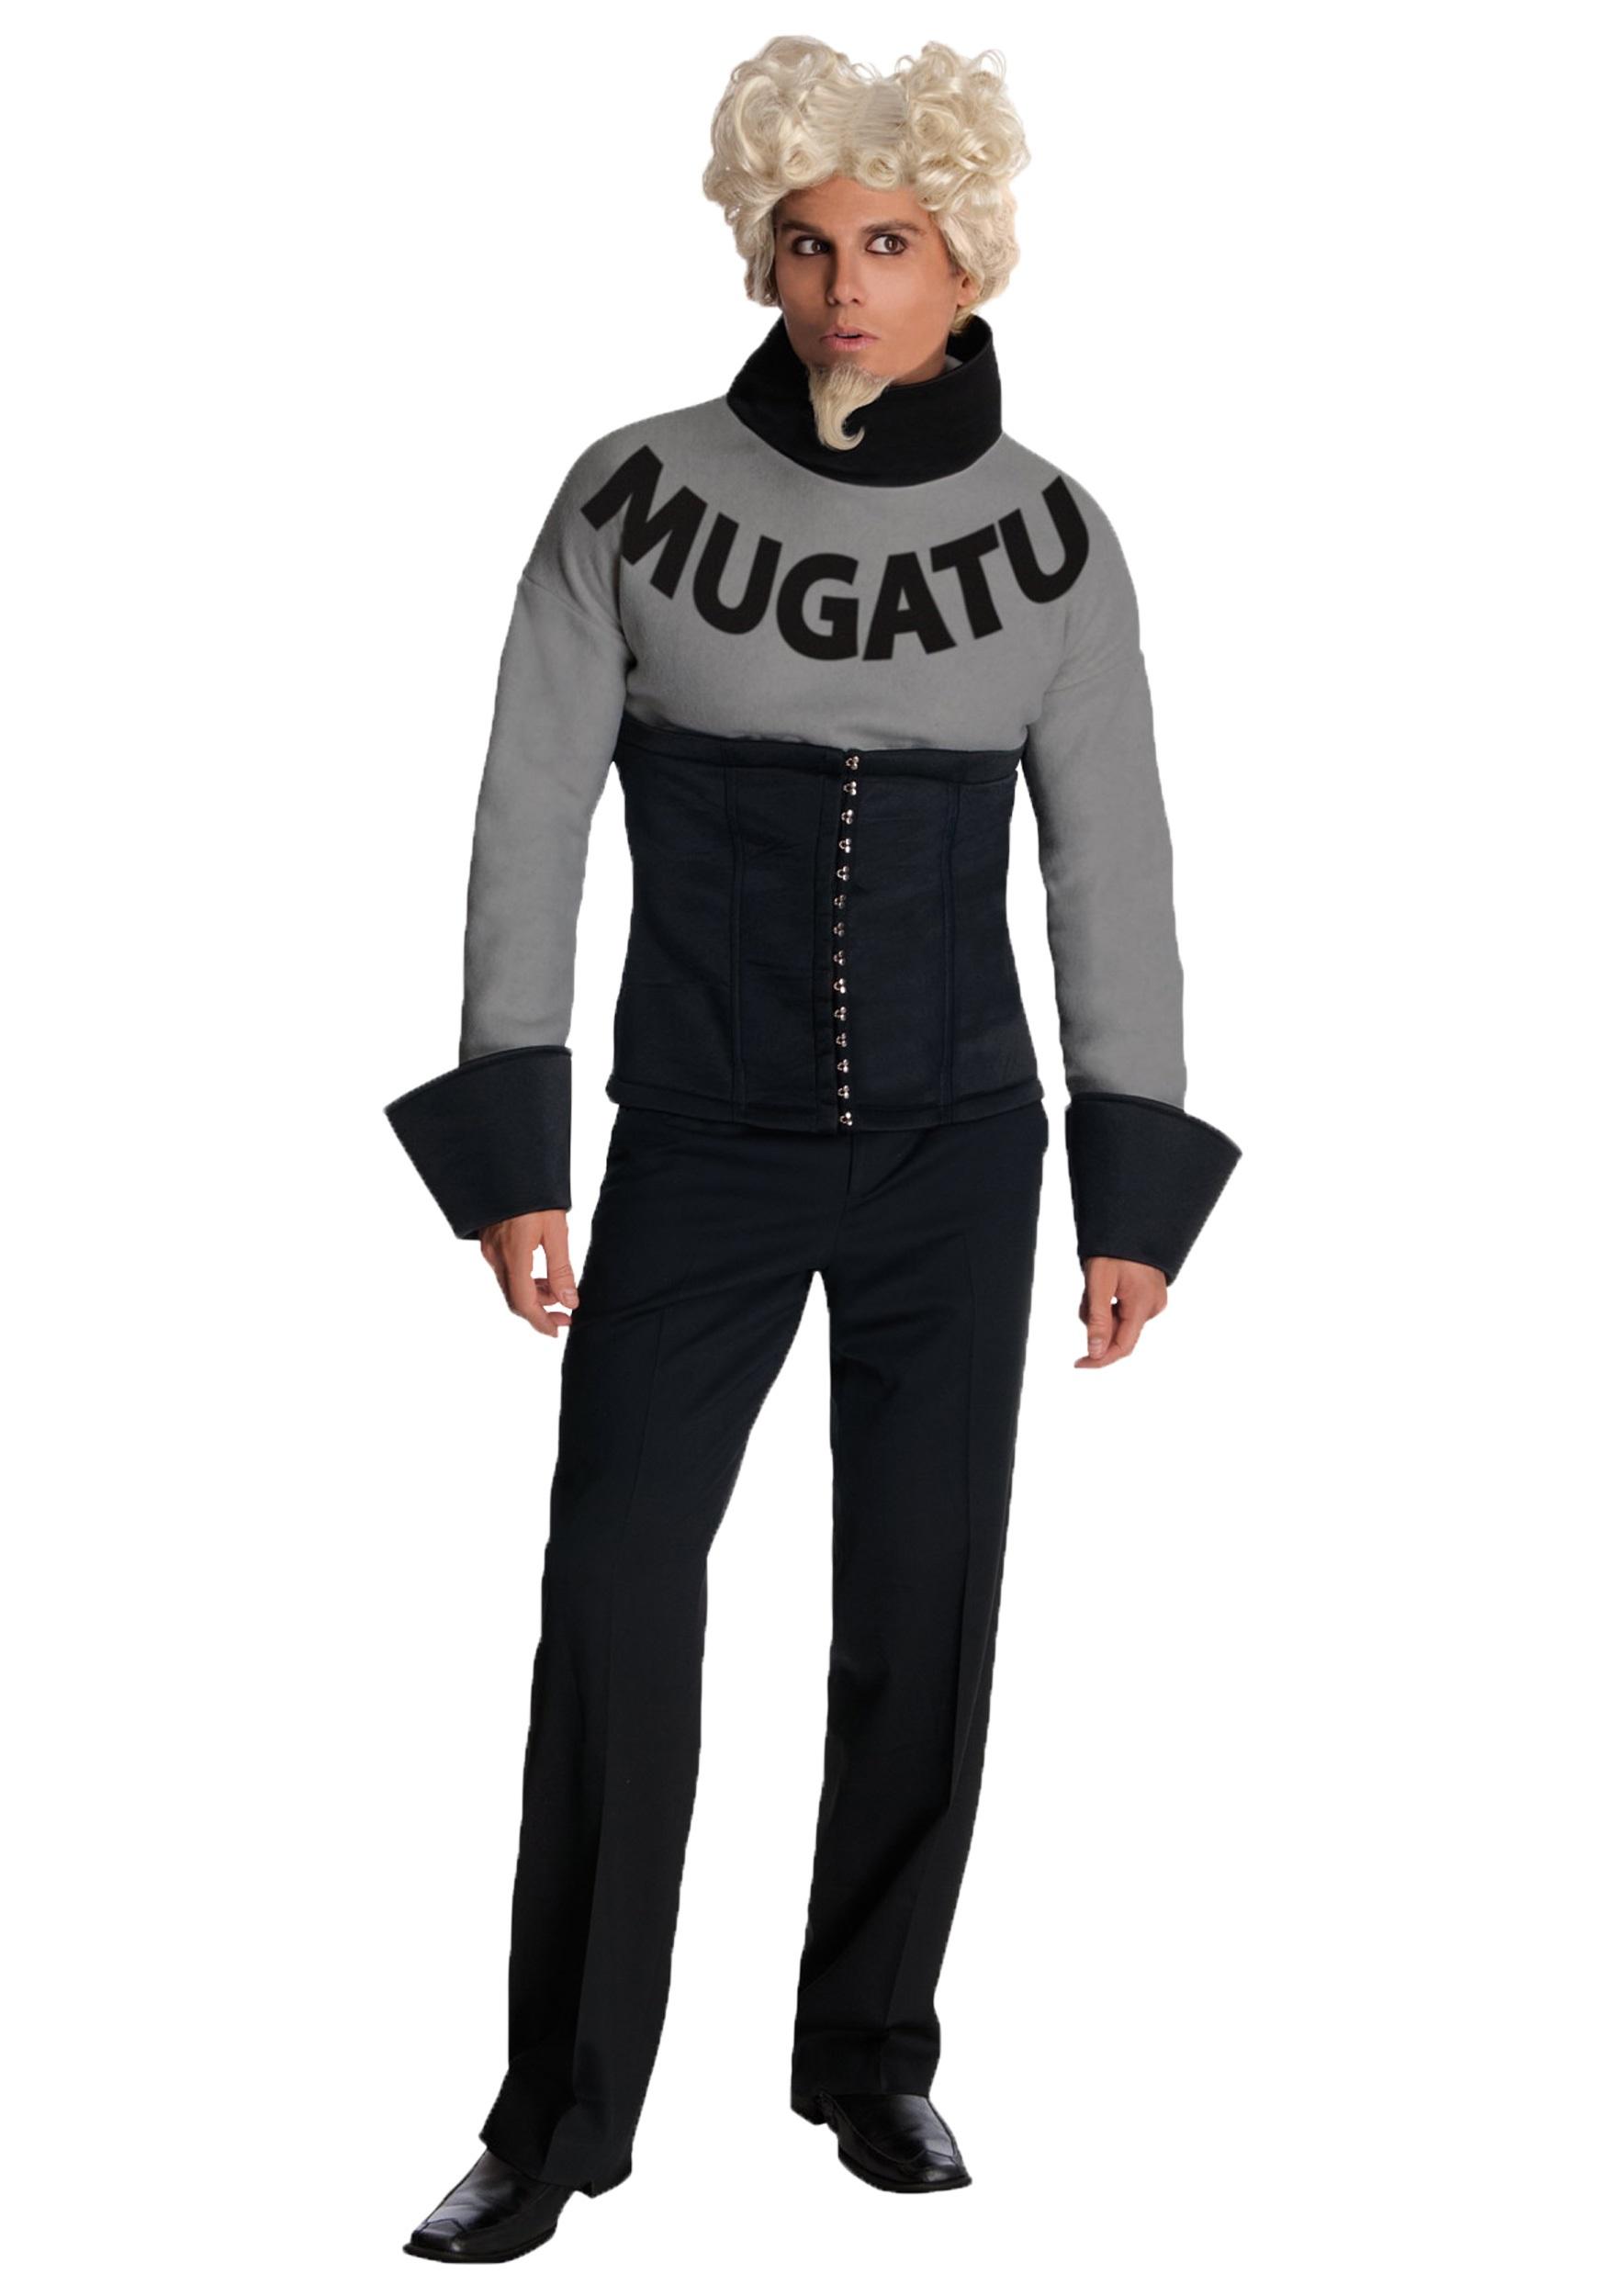 Zoolander Mugatu Costume for Men